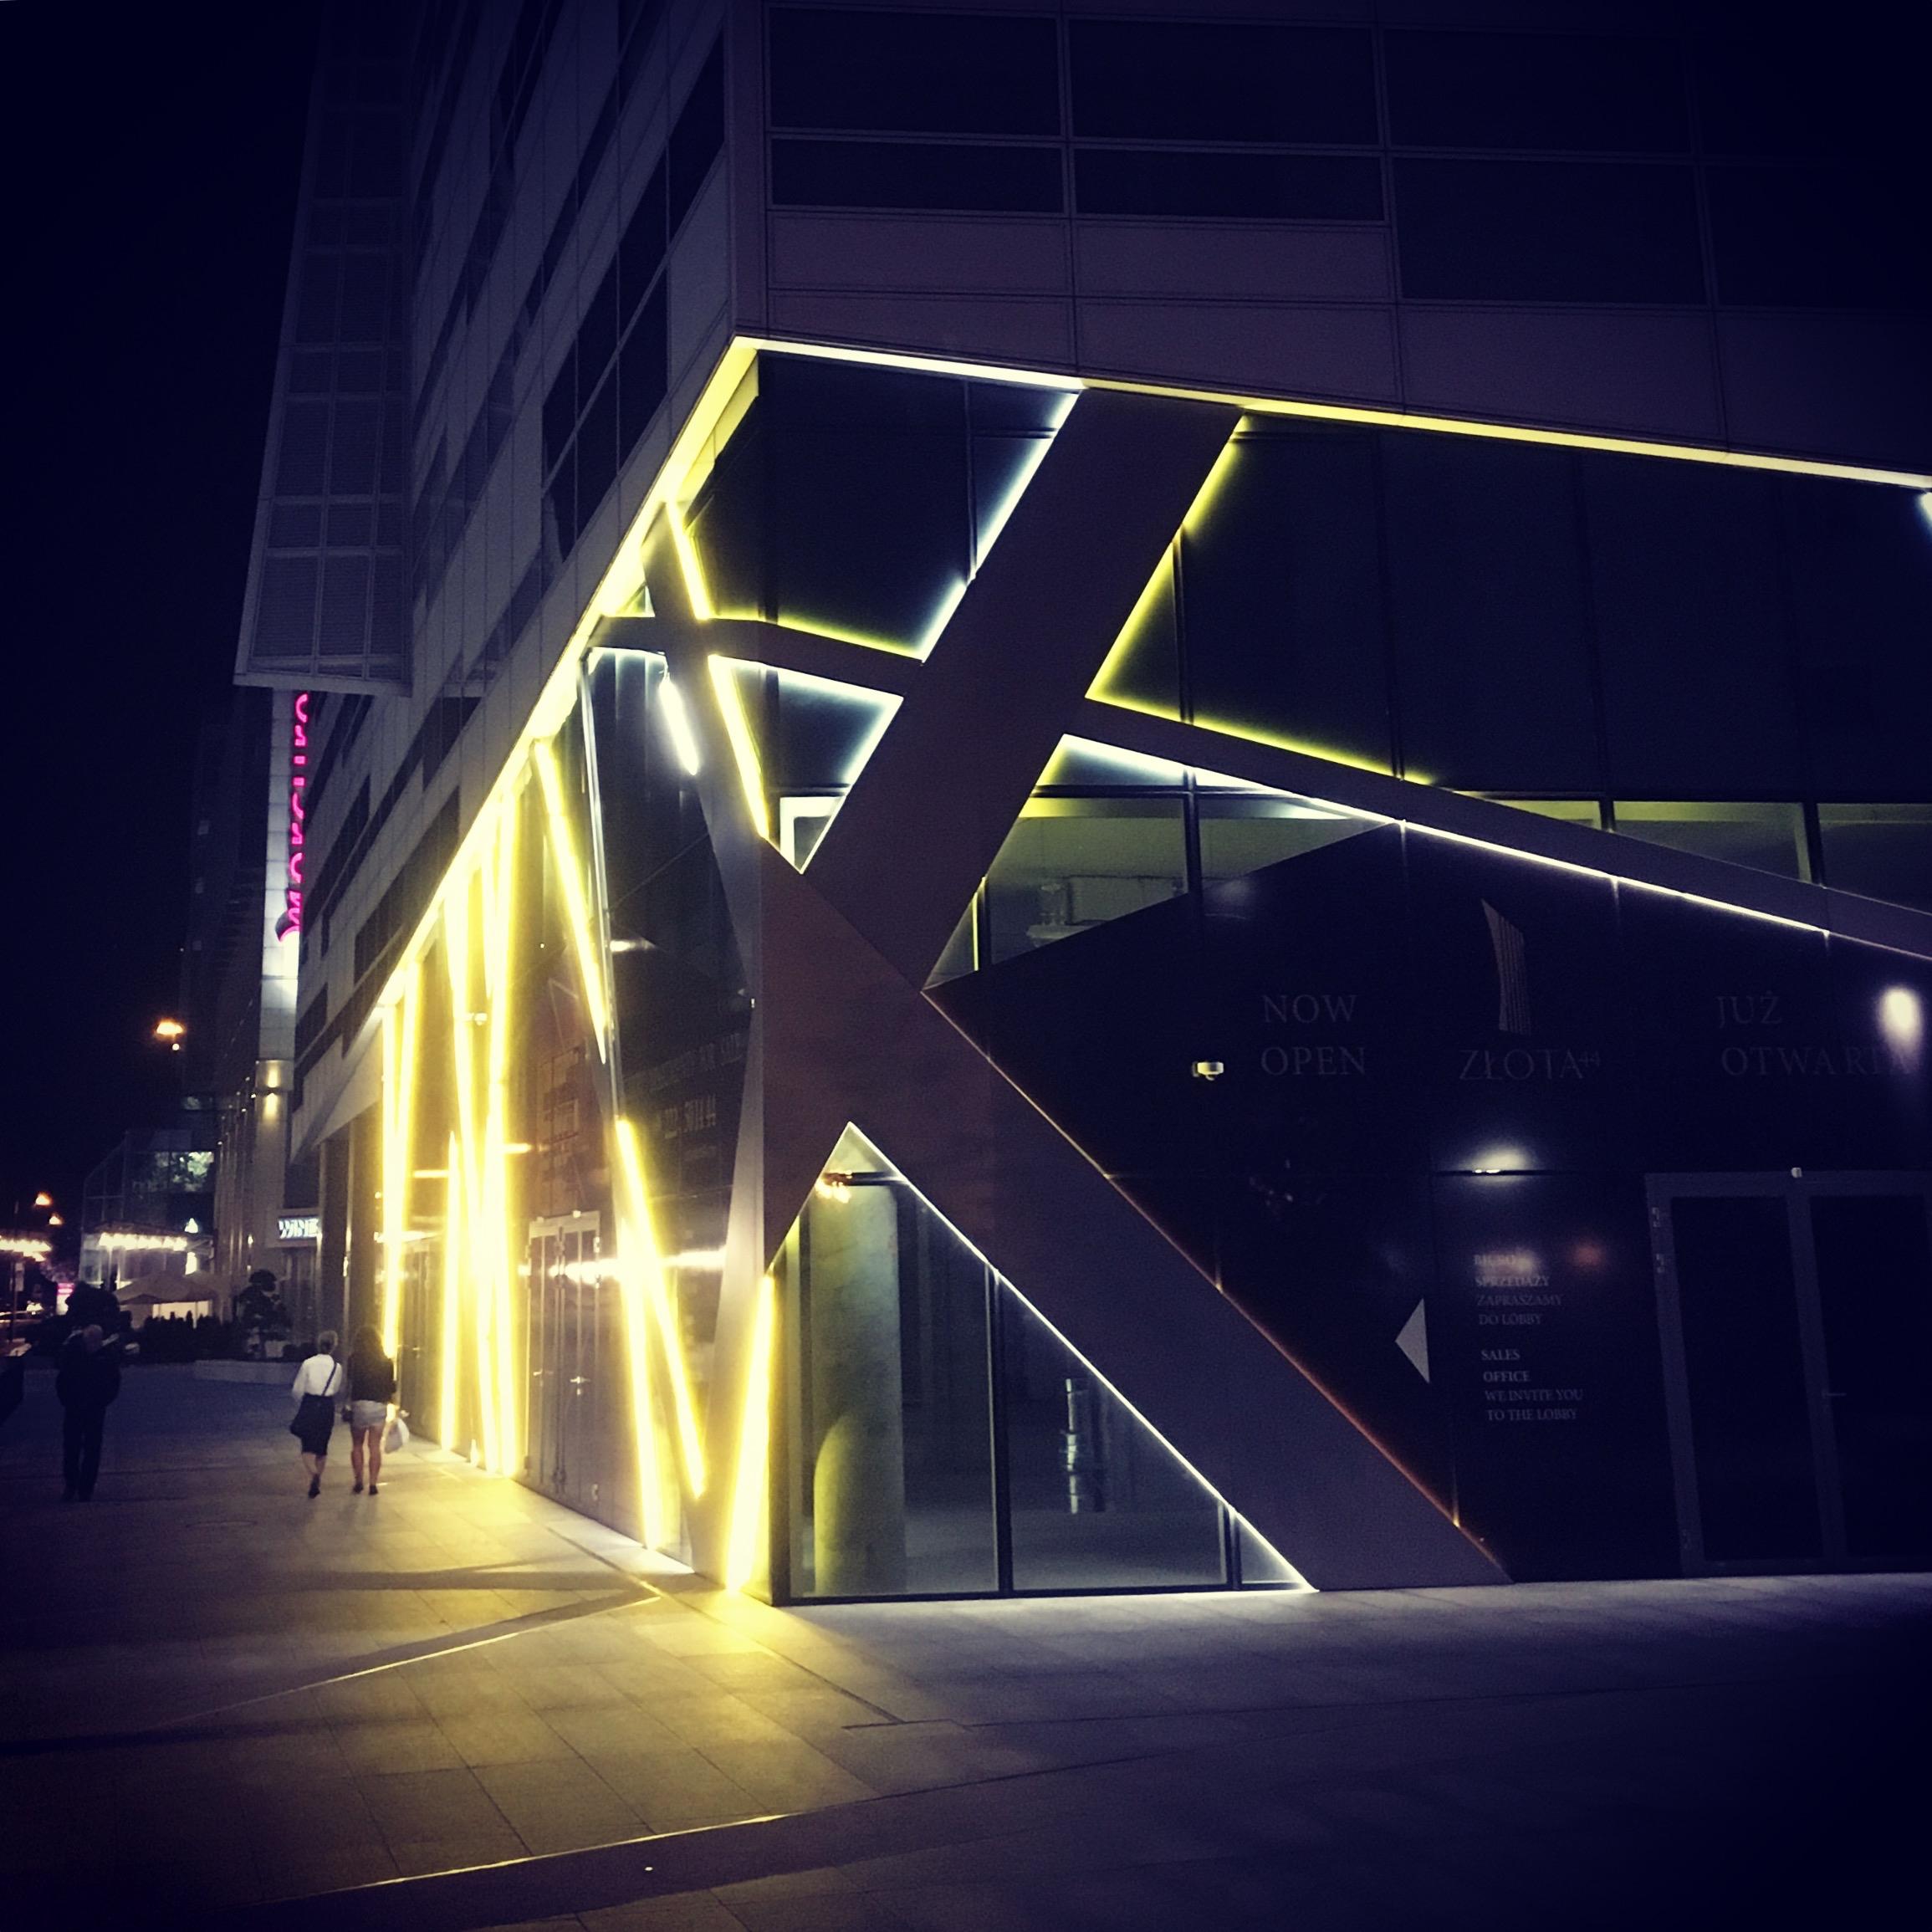 Lights lines architecture extra - stigergutt | ello